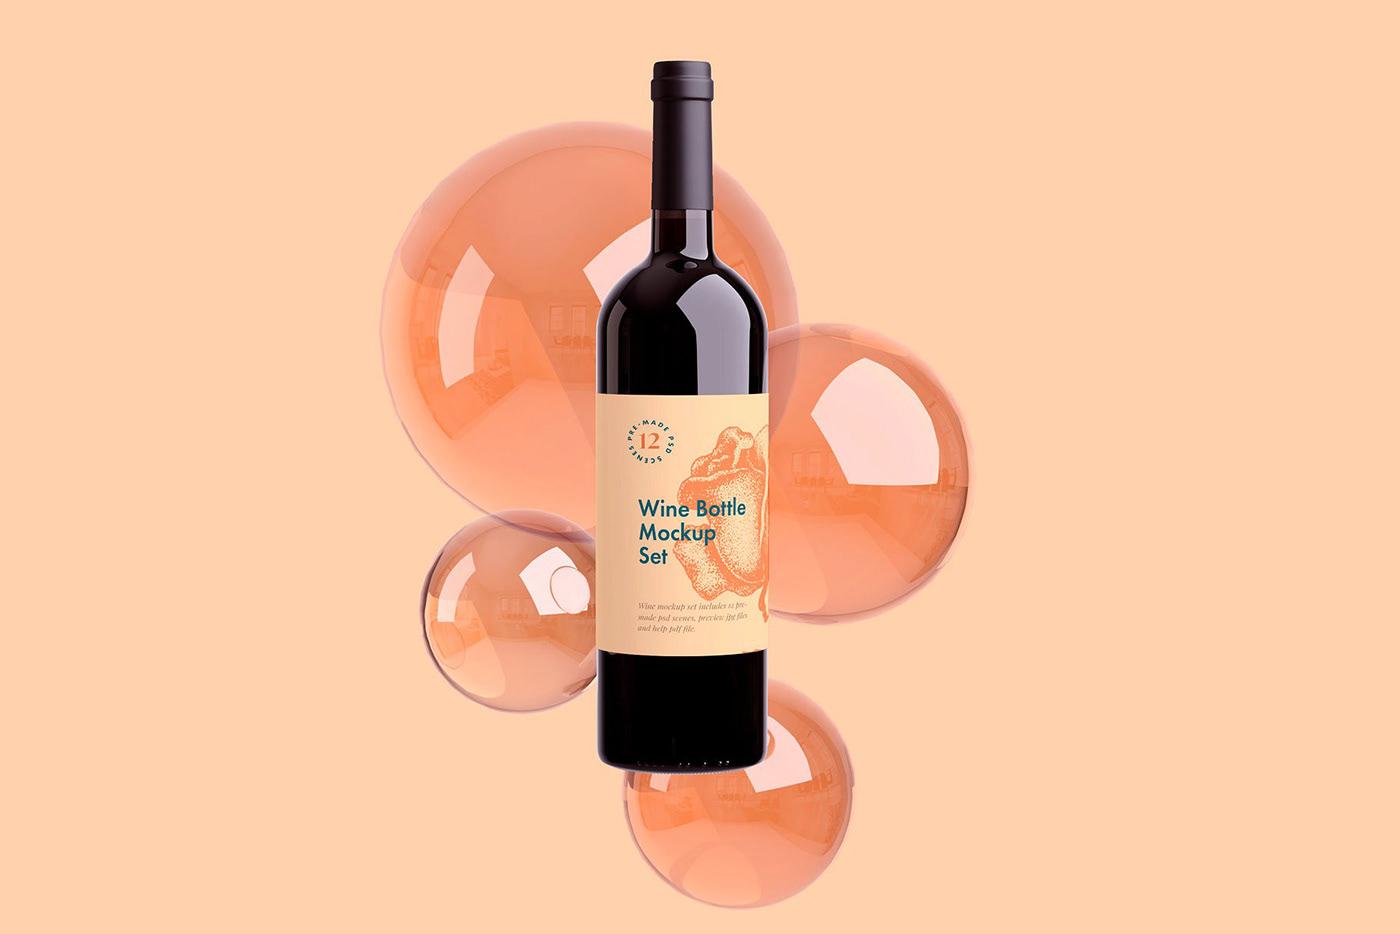 PSD мокап вина. wine bottle mockup